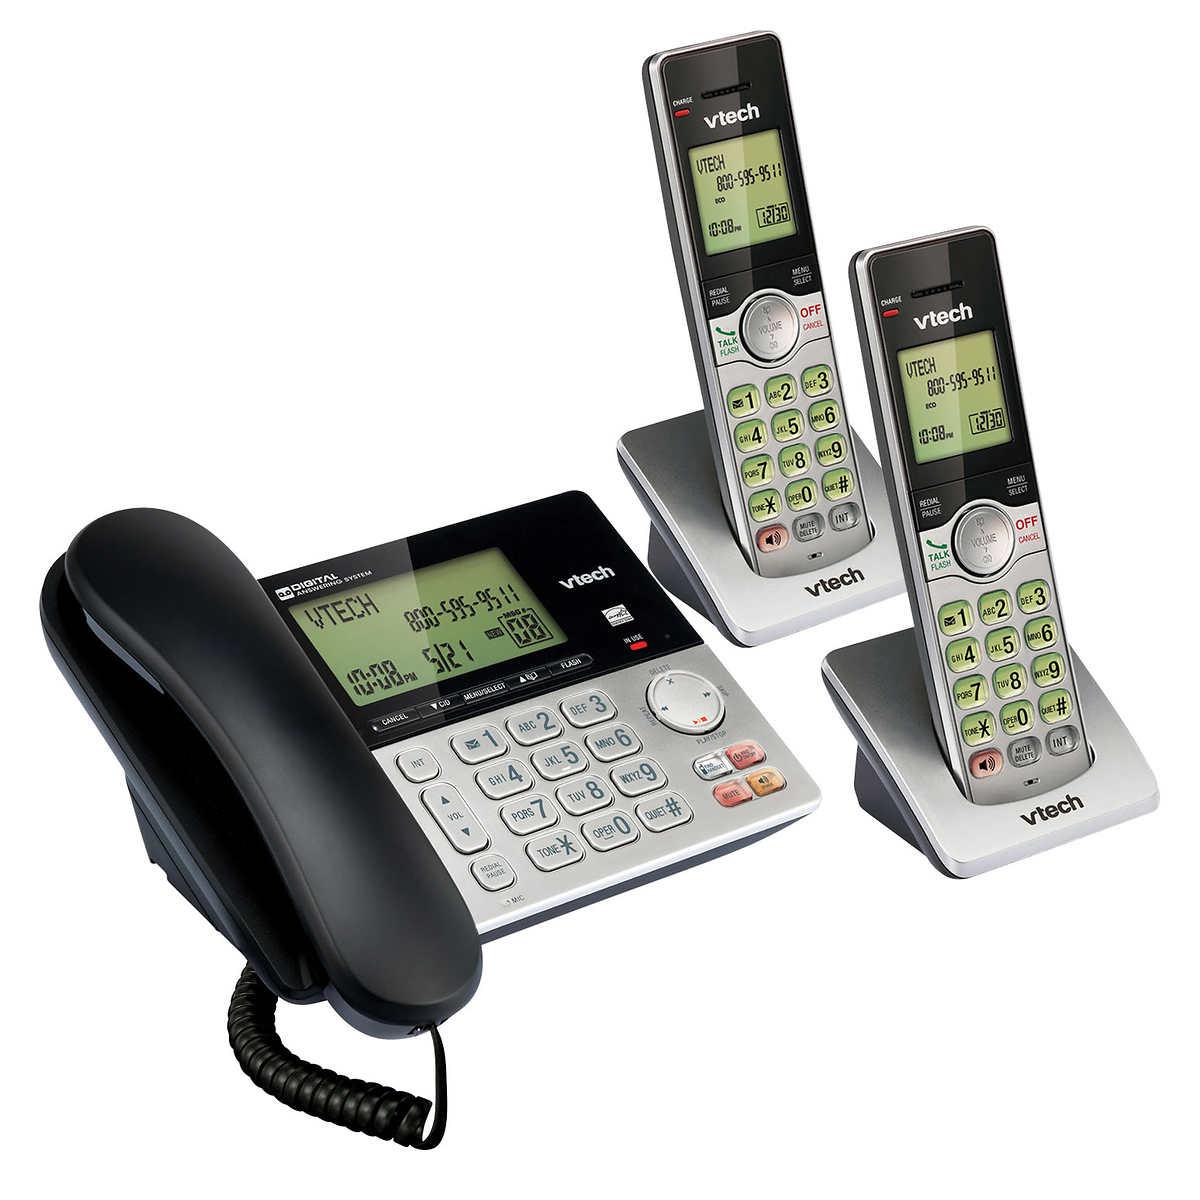 VTech CS6949-2 DECT 6.0 2 Handset Corded Cordless Phone